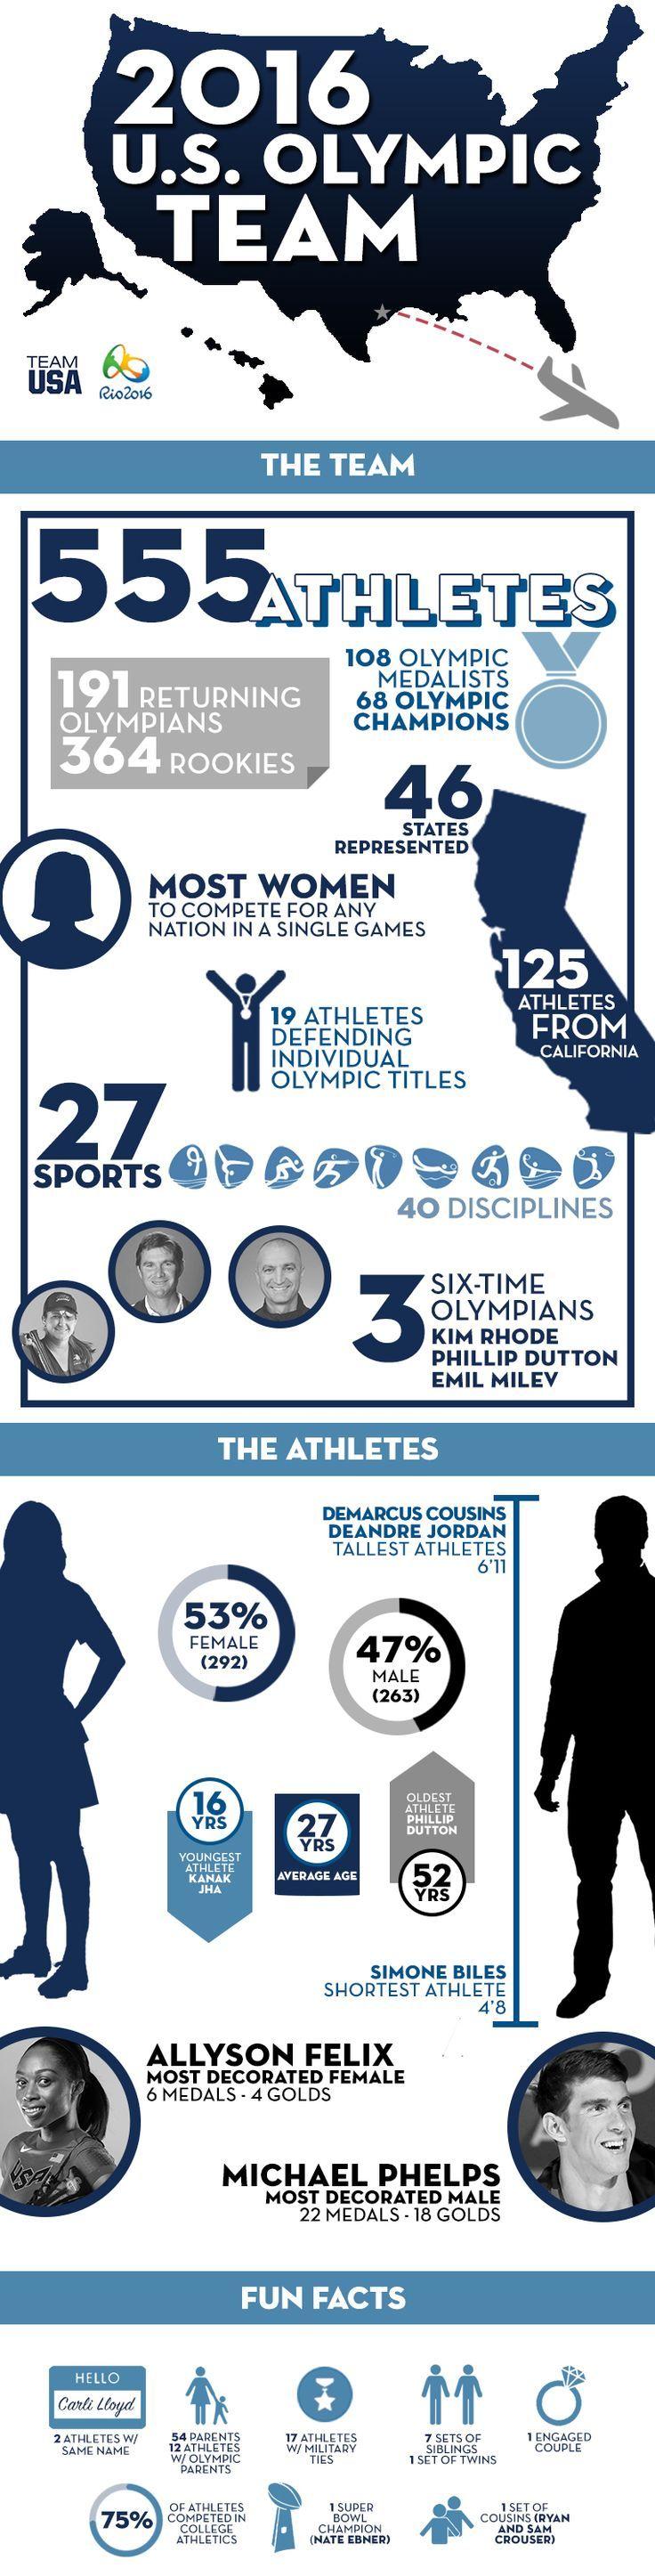 U.S. Olympic Committee Announces 555-Member 2016 U.S. Olympic Team